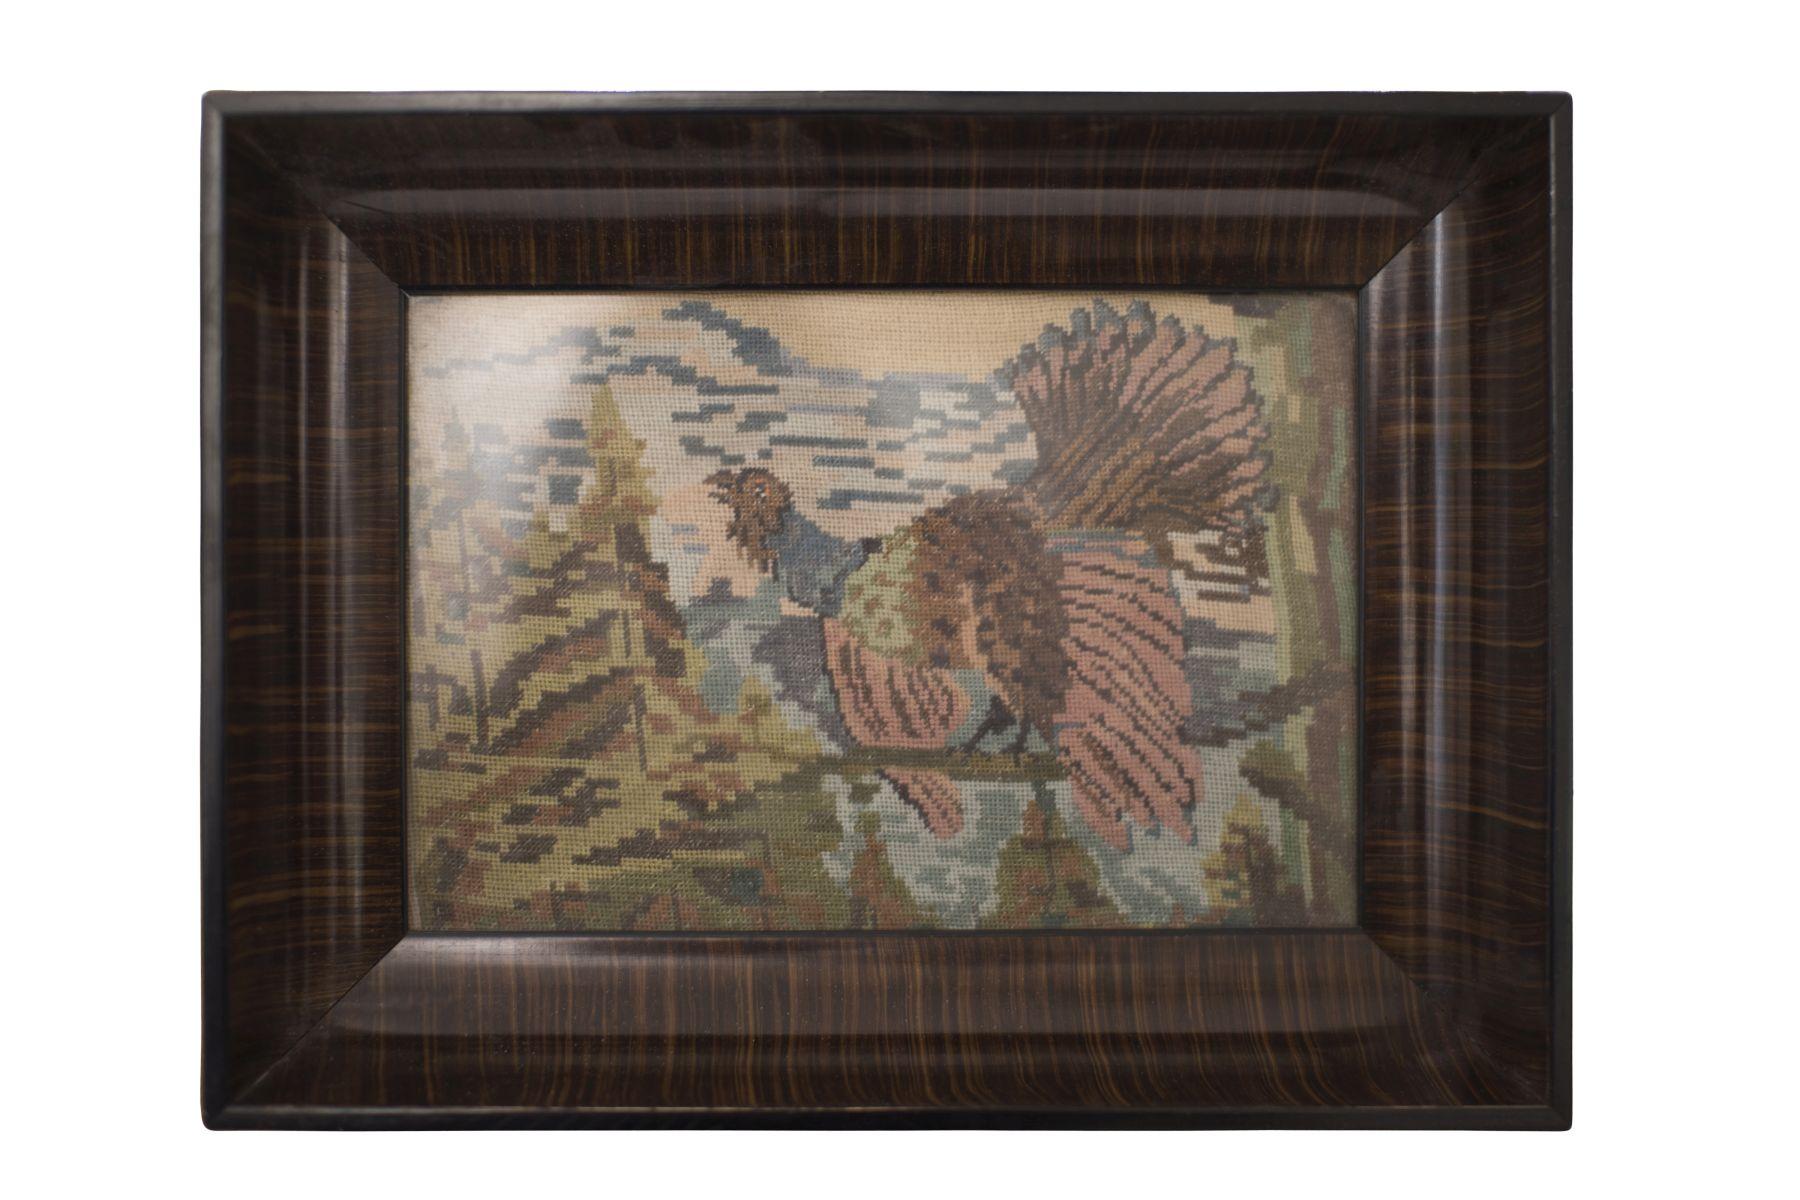 "#87 Austrian Artist 20th Century "" Gobelin in Frame"" | Künstler Österreich 20. Jahrhundert ""Gobelin in Rahmen"" Image"